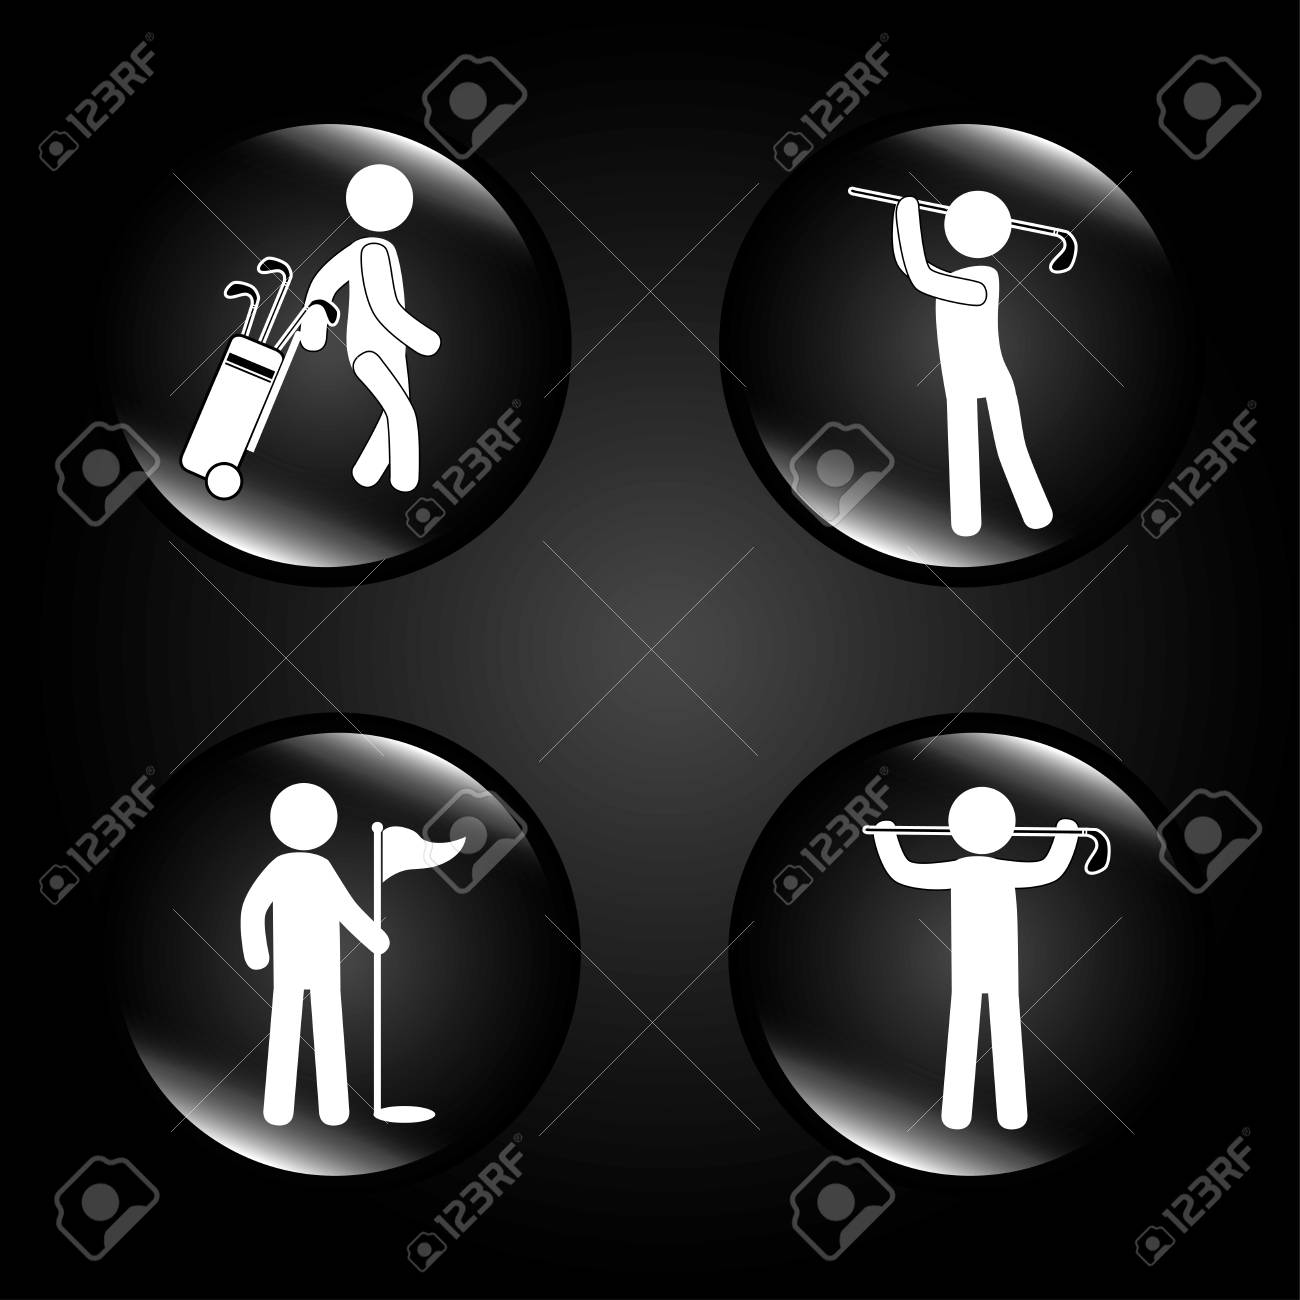 golf design over black background vector illustration Stock Vector - 22453240